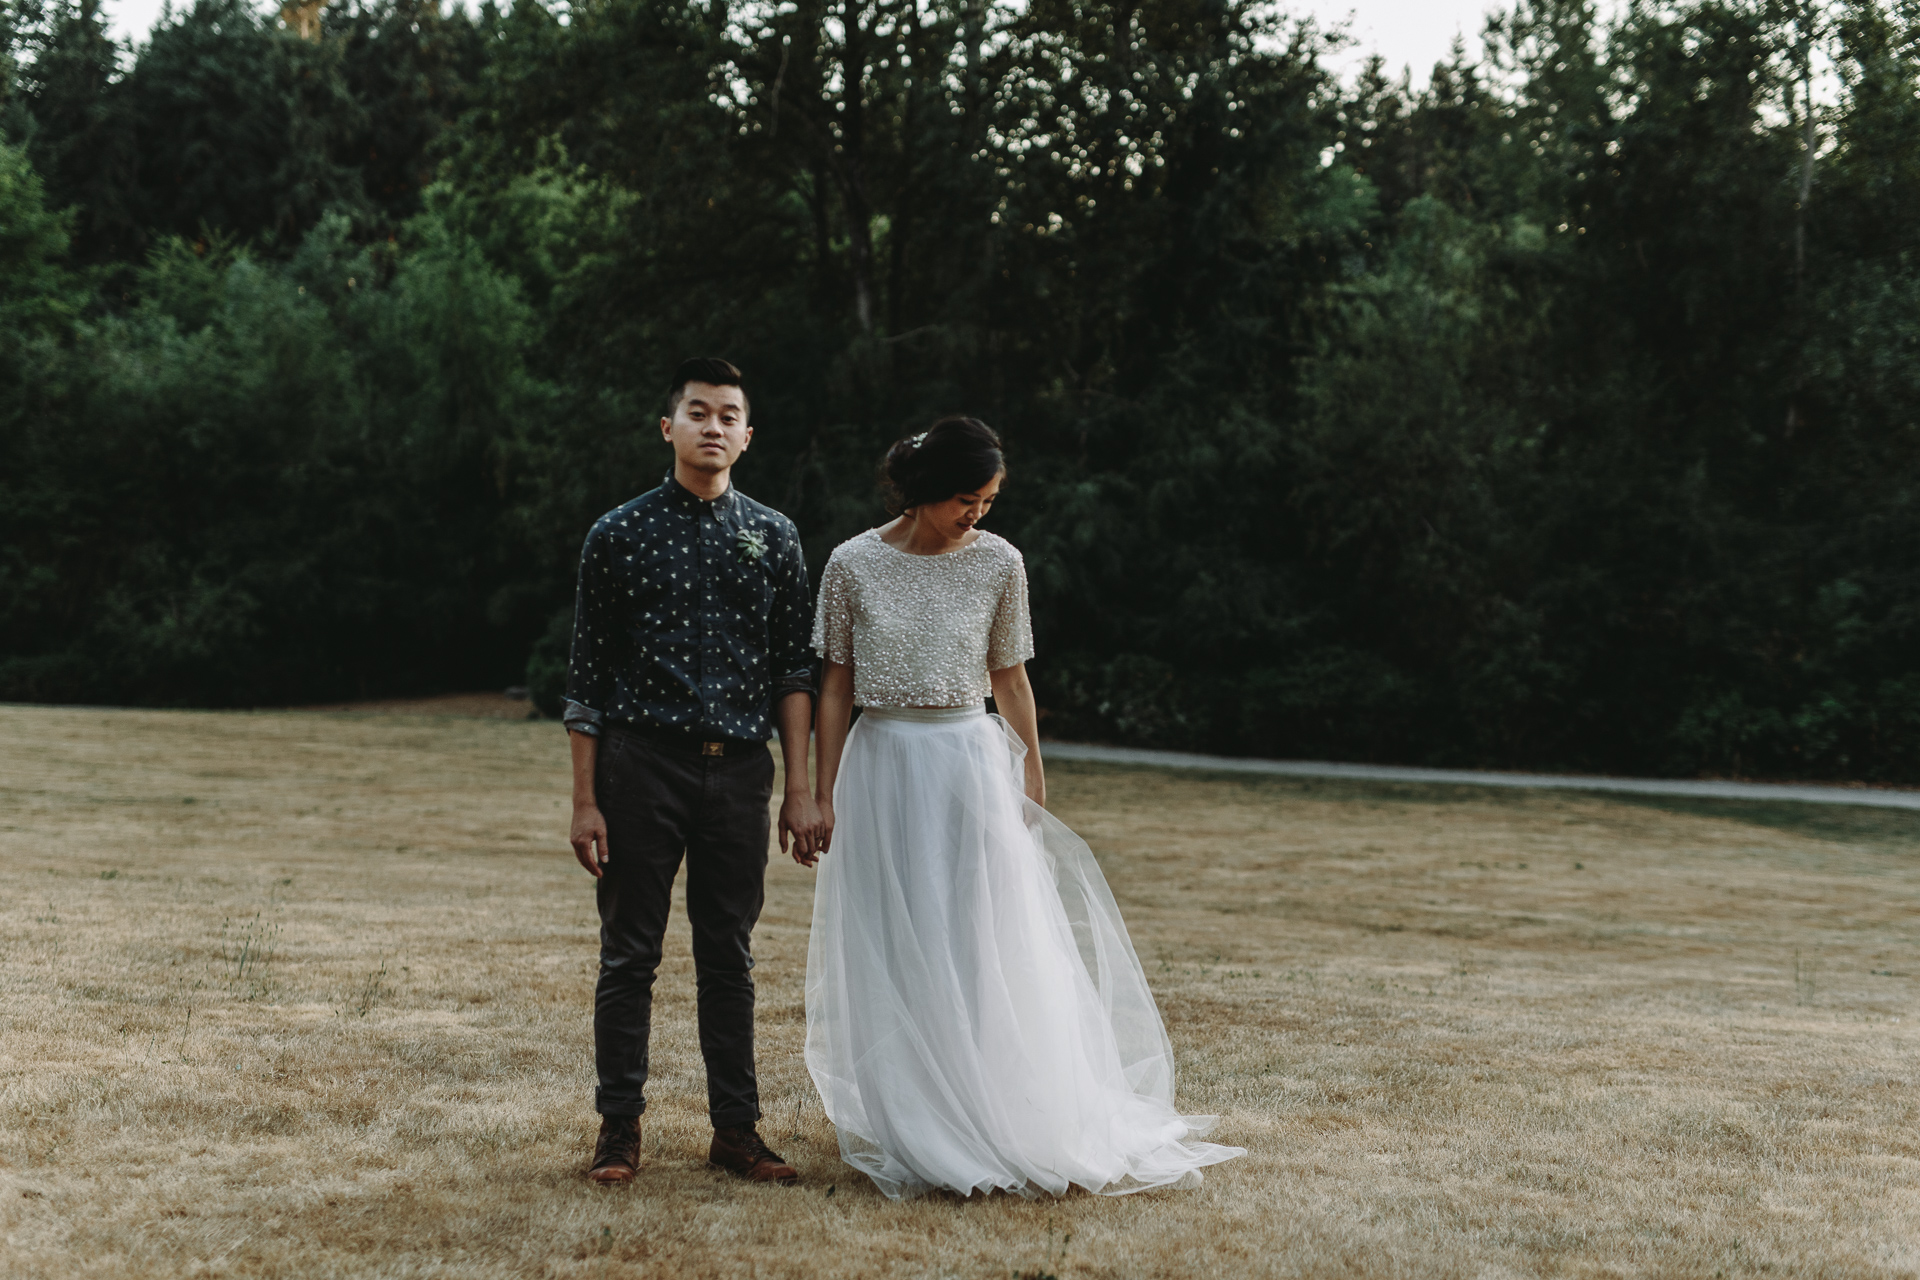 jess-hunter-seattle-artistic-wedding-photographer-5920.jpg